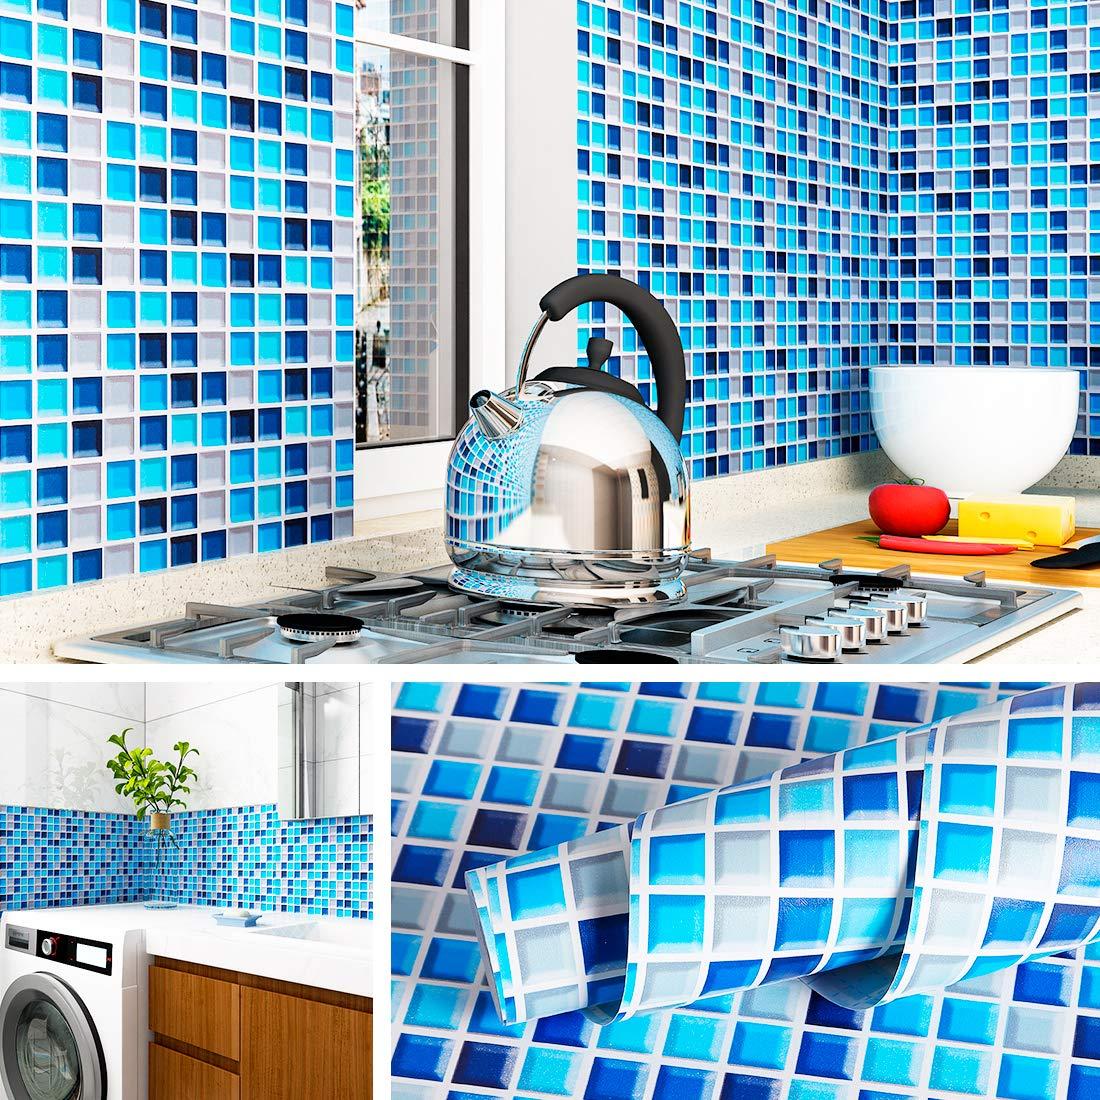 Livelynine Kitchen Wallpaper Peel And Stick Backsplash 17 7x276 Inch Blue Mosaic Wall Paper Decorations Bathroom Backsplash Waterproof Removable Buy Online In Dominica At Dominica Desertcart Com Productid 146670839